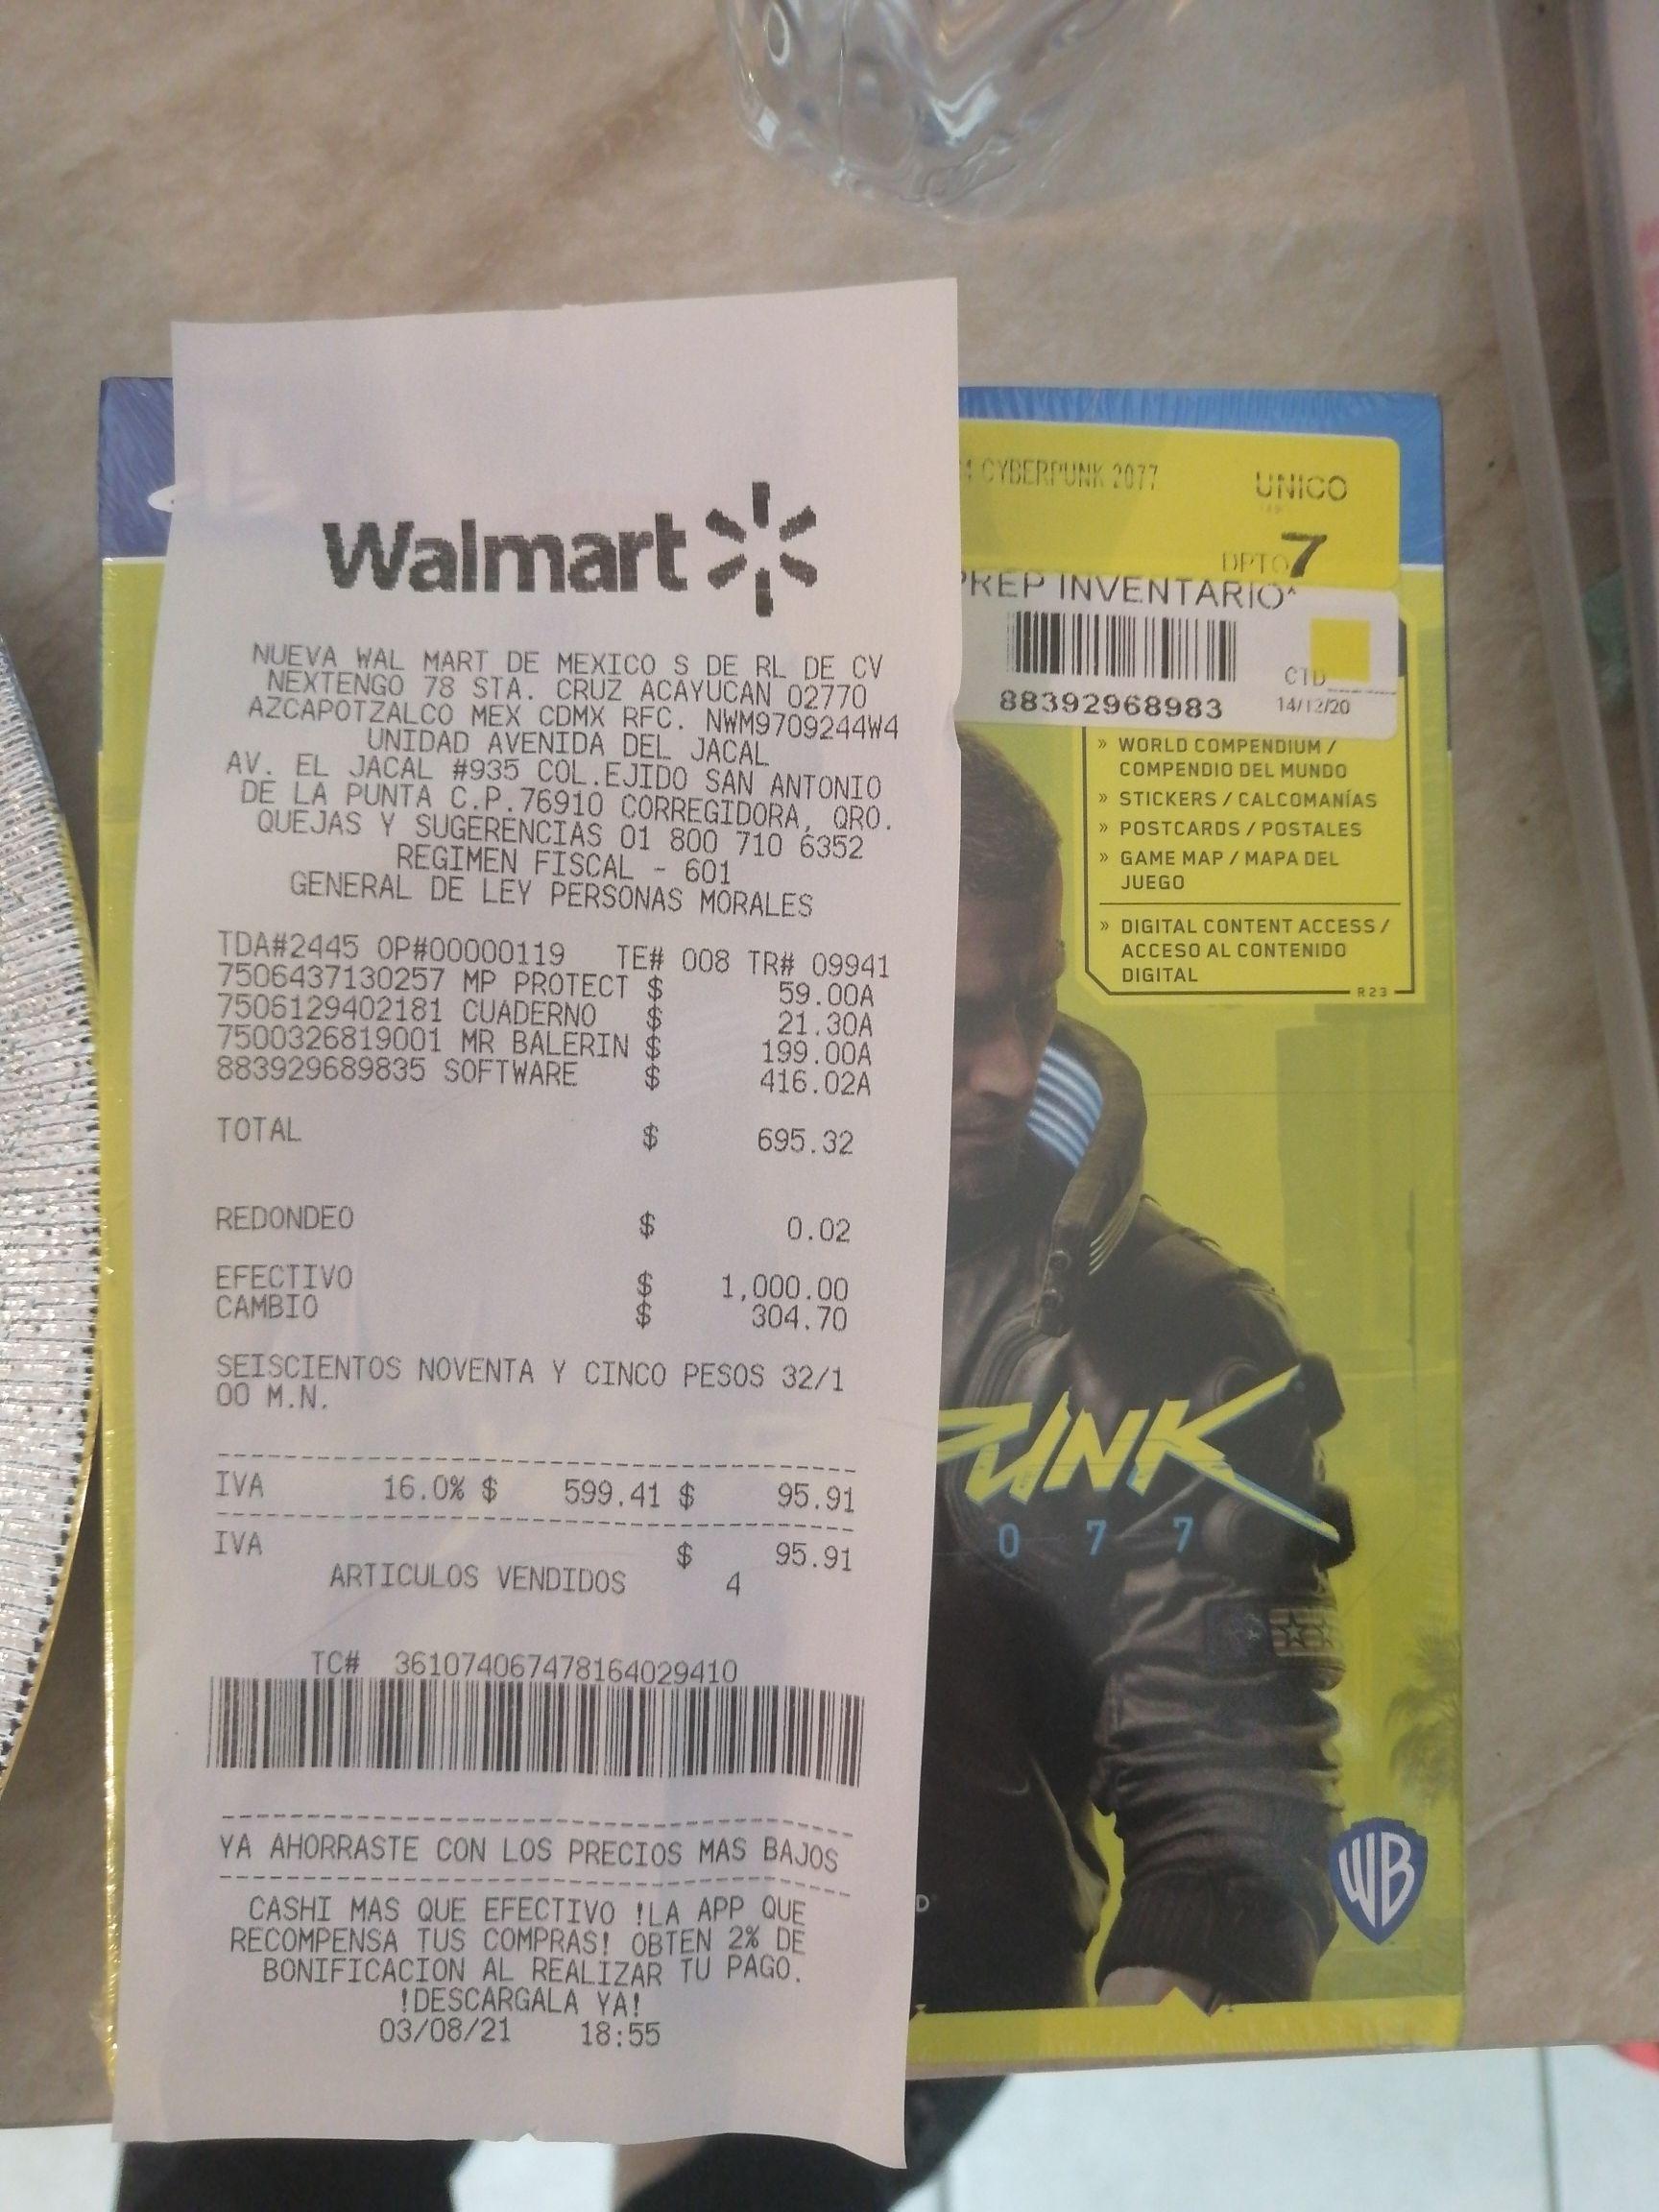 Walmart: Ciberpunk ps4